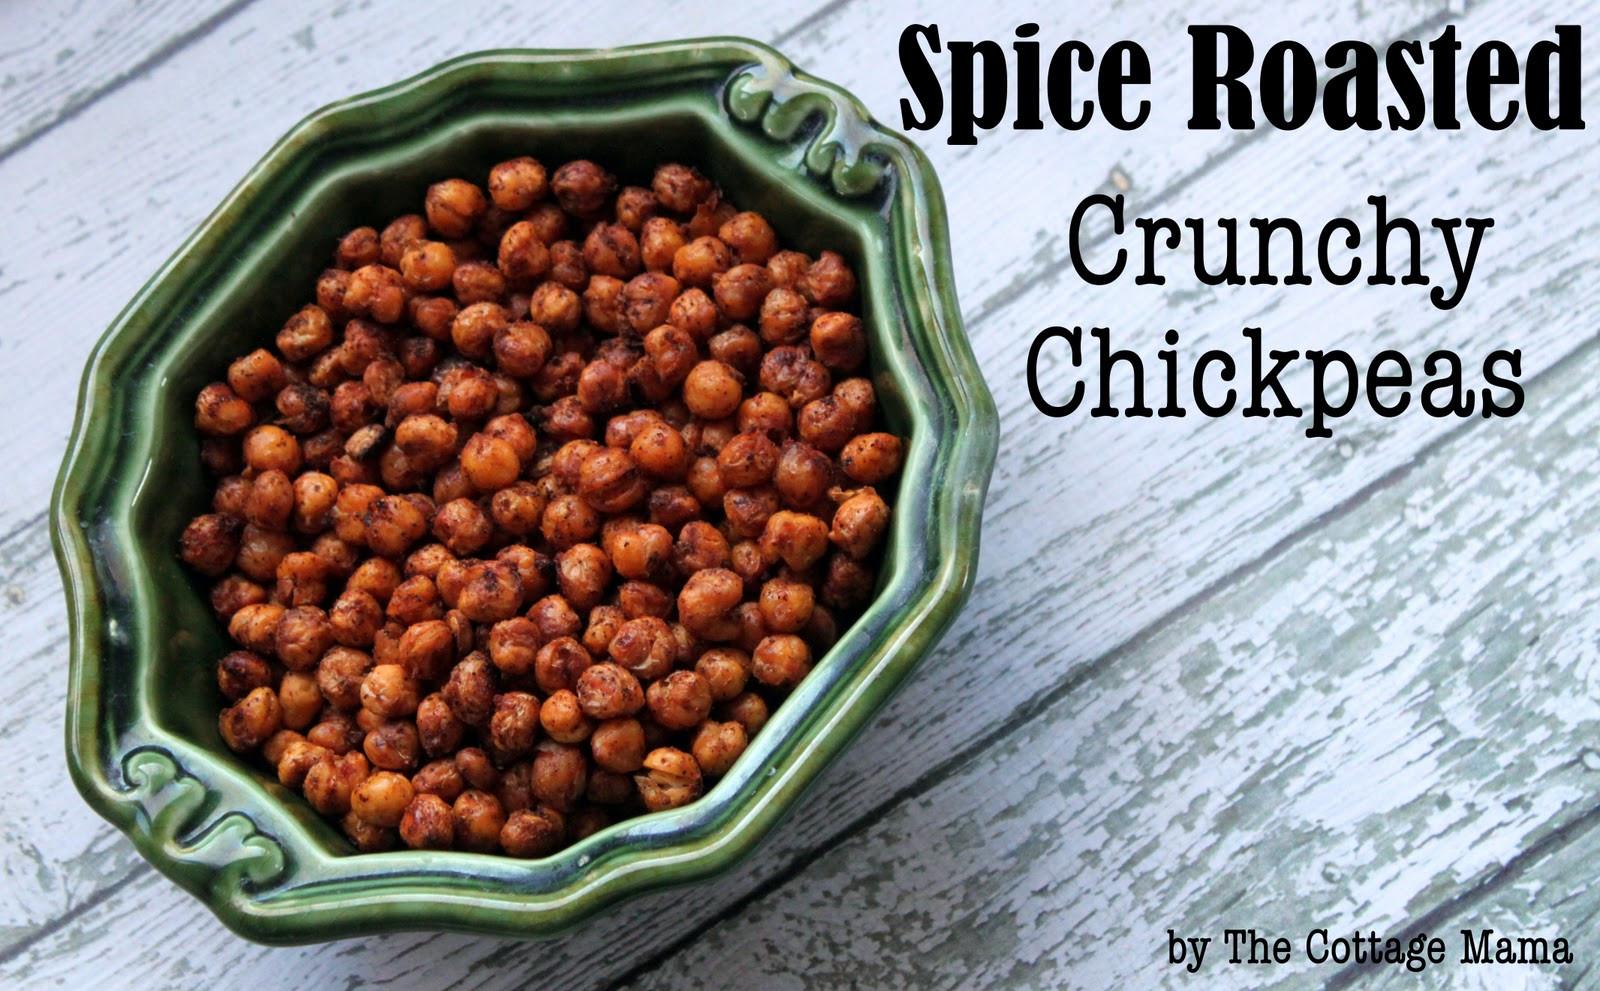 Healthy Crunchy Snacks  Easy Healthy Snack Spice Roasted Crunchy Chickpeas